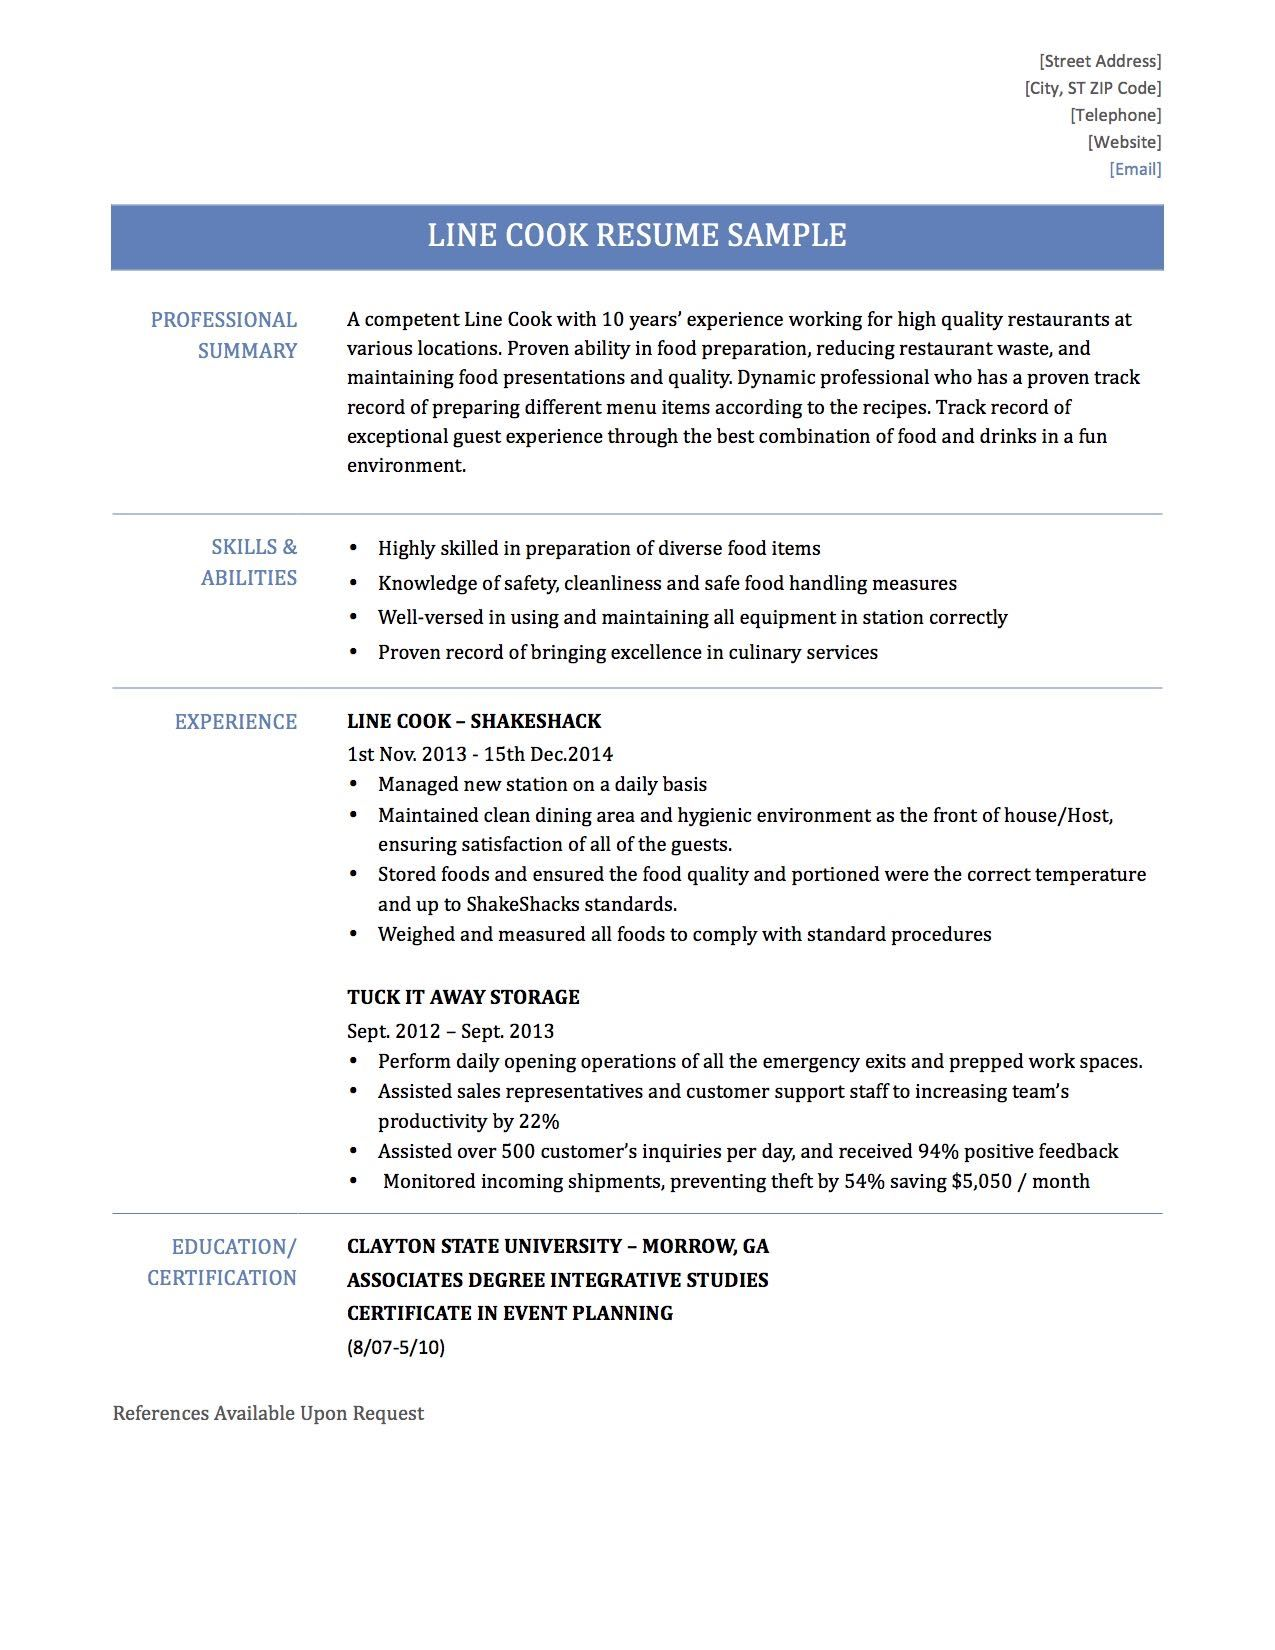 Sample Resume For Cook Job Grill Samples Chef Description Cooking